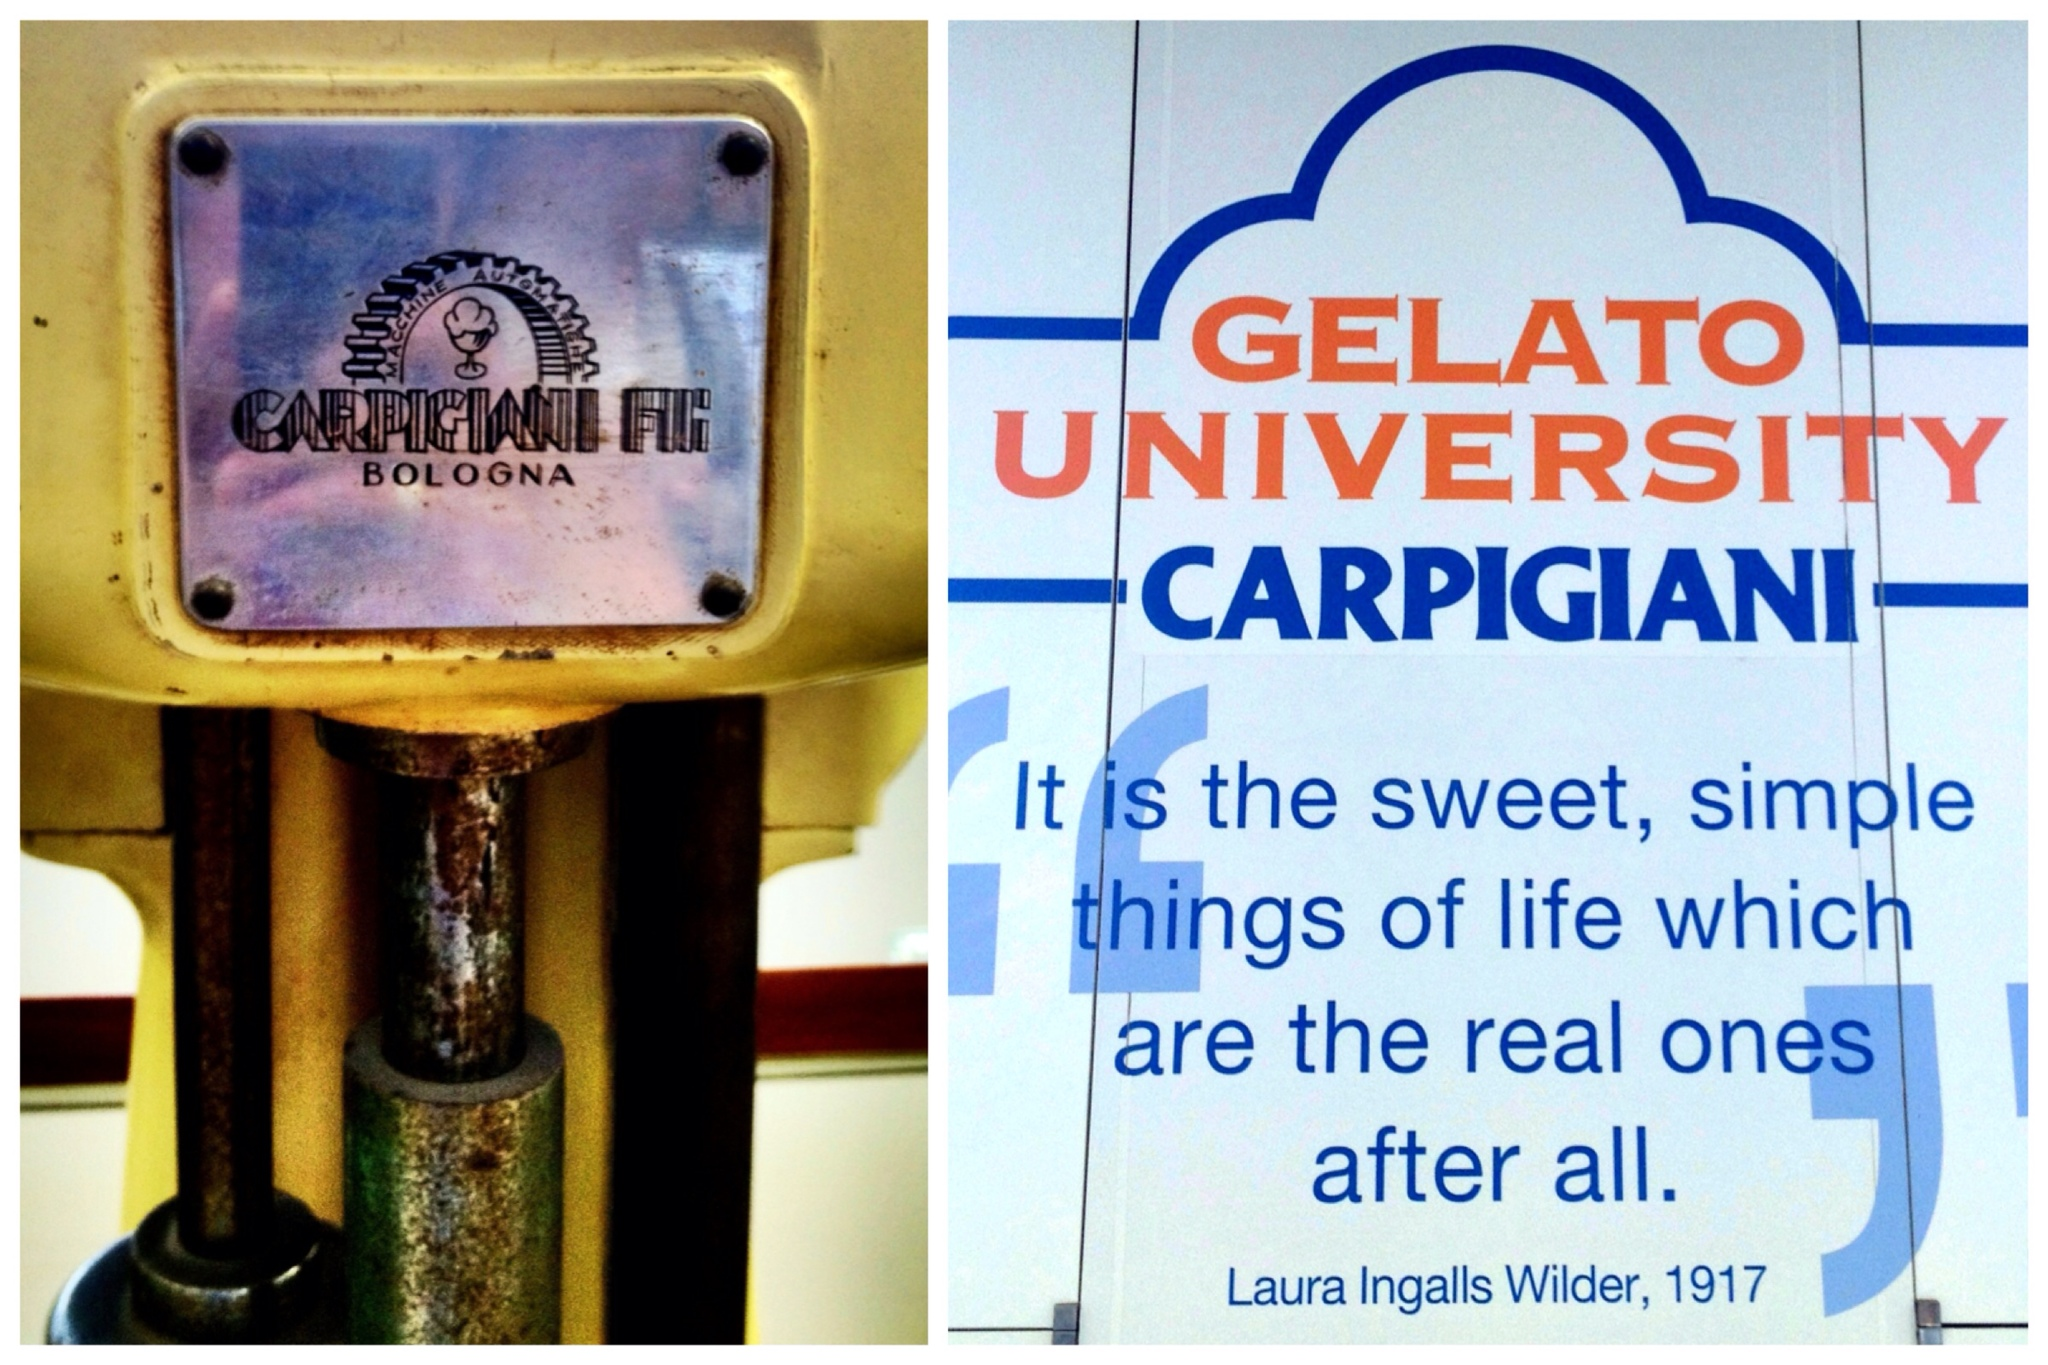 Gelato University Carpigiani, Bologna Italy